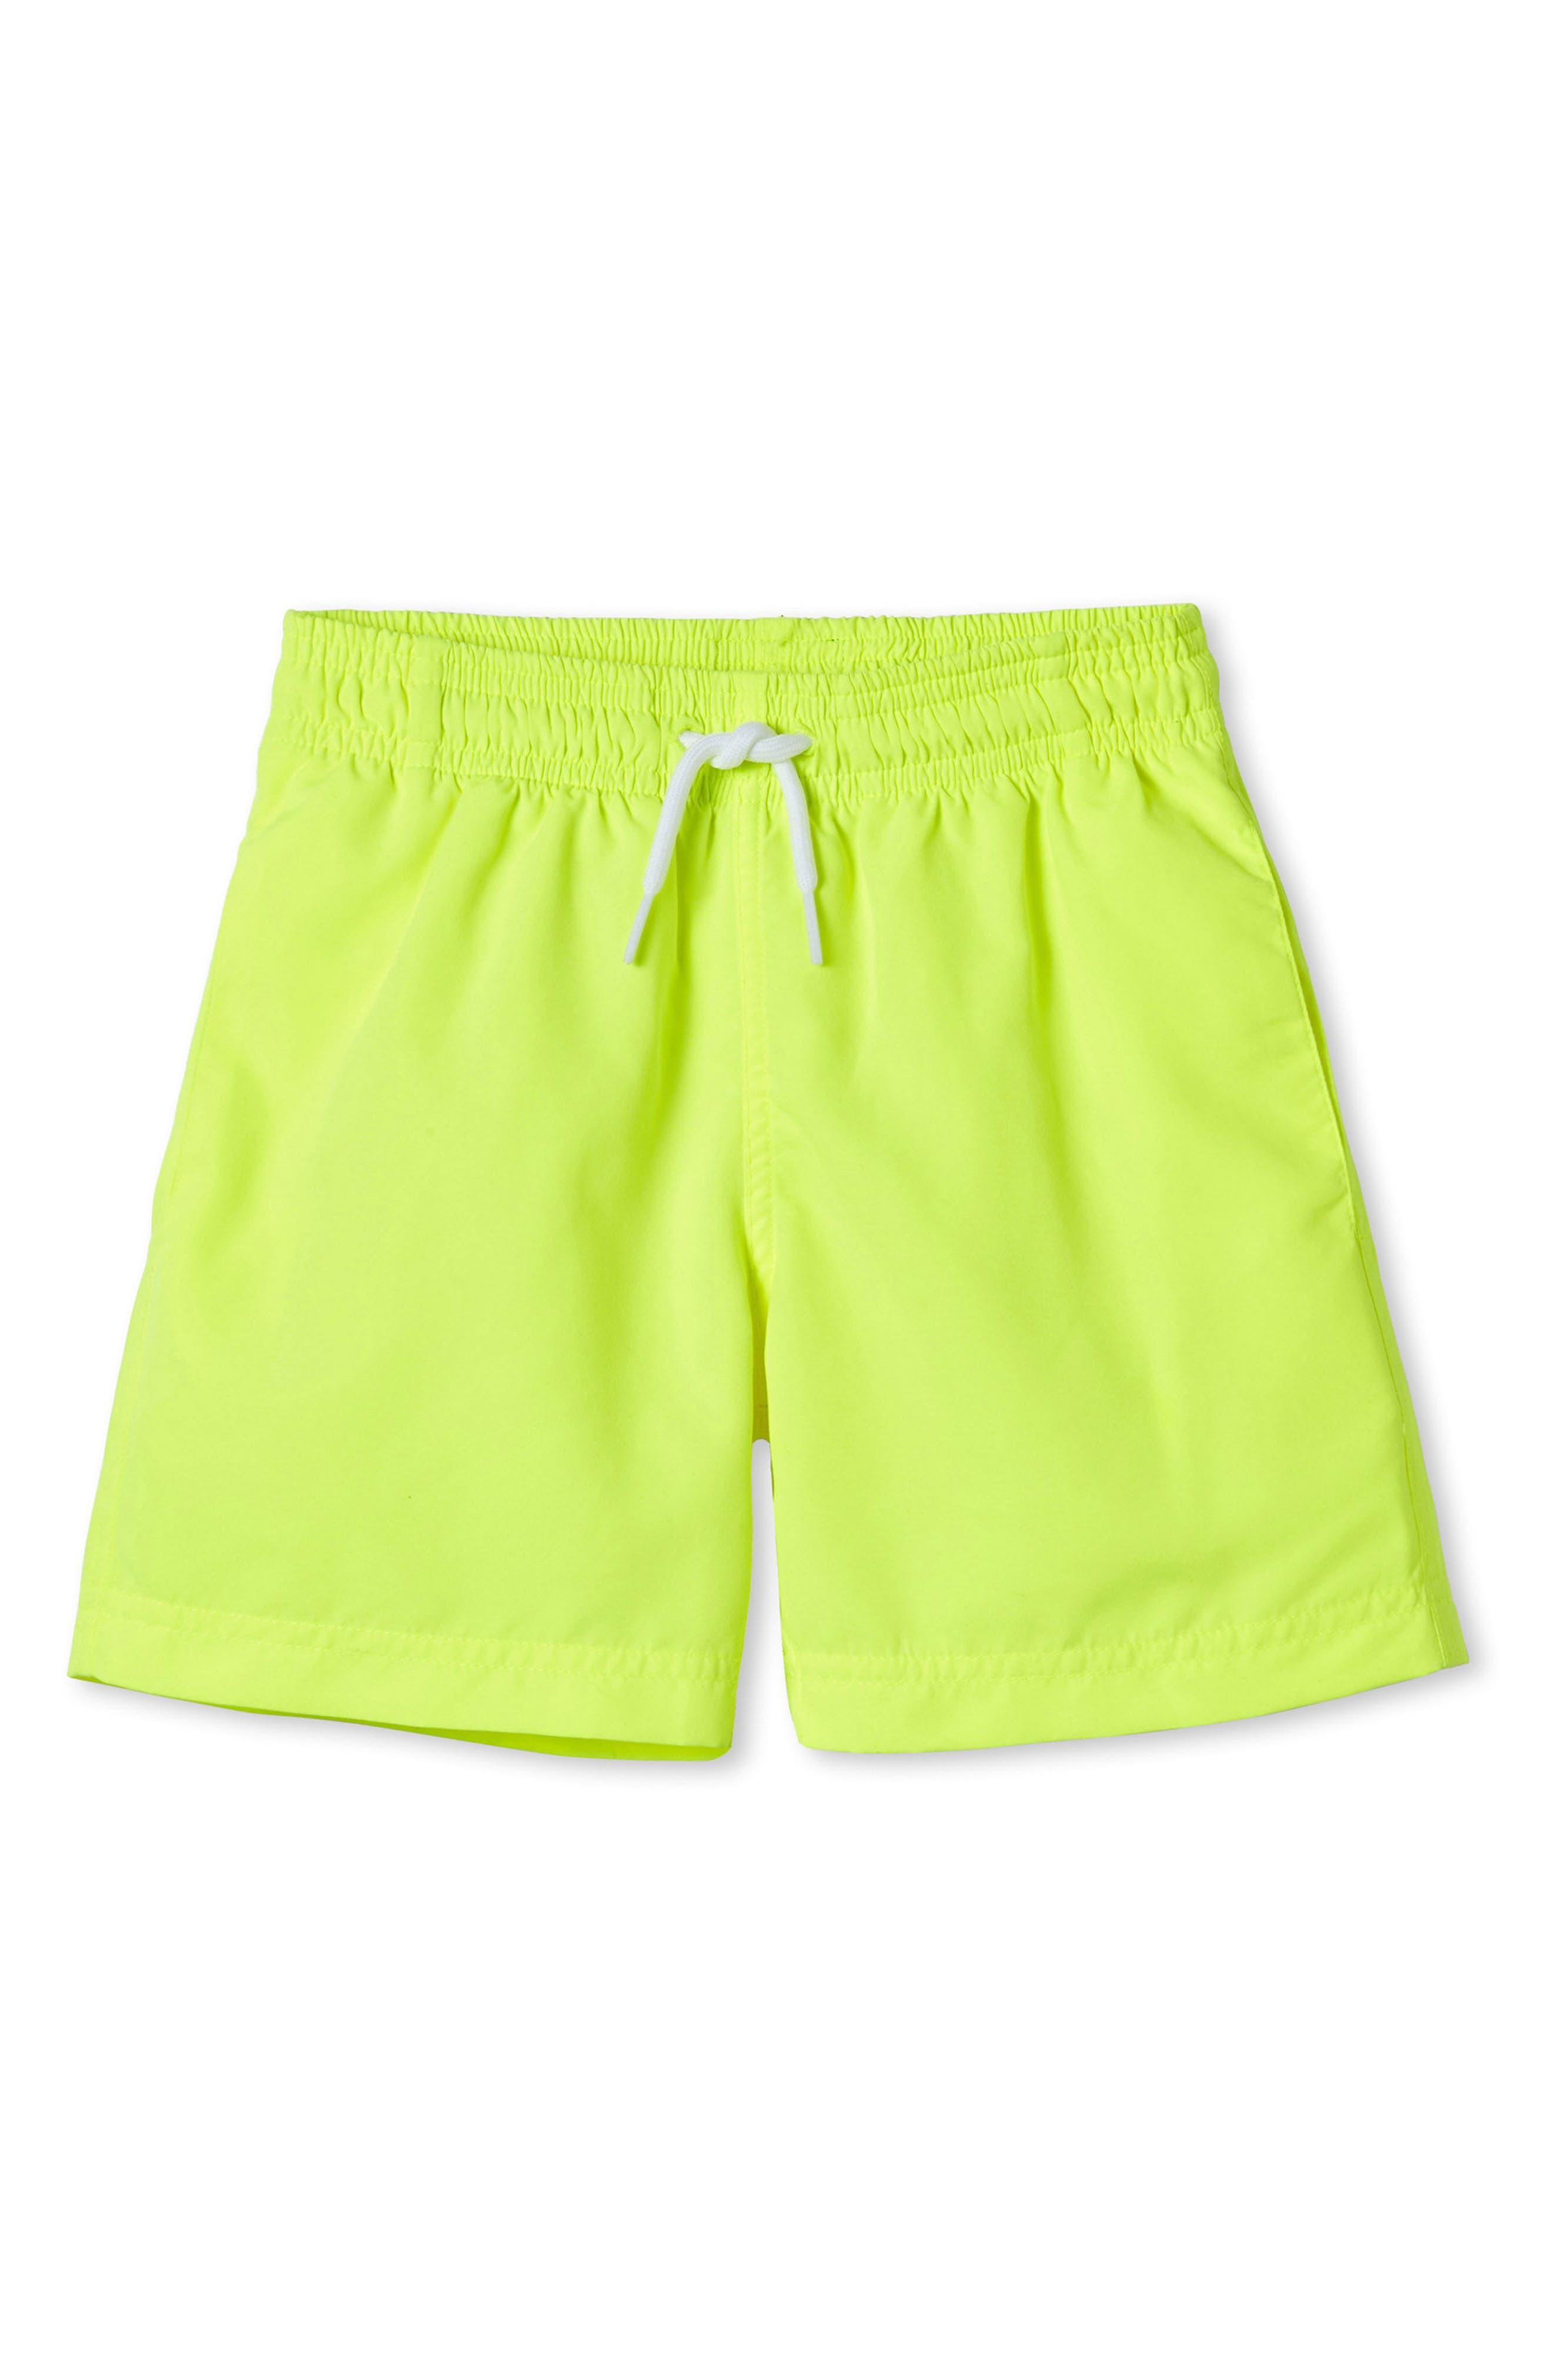 Neon Yellow Swim Trunks,                             Main thumbnail 1, color,                             Neon Yellow